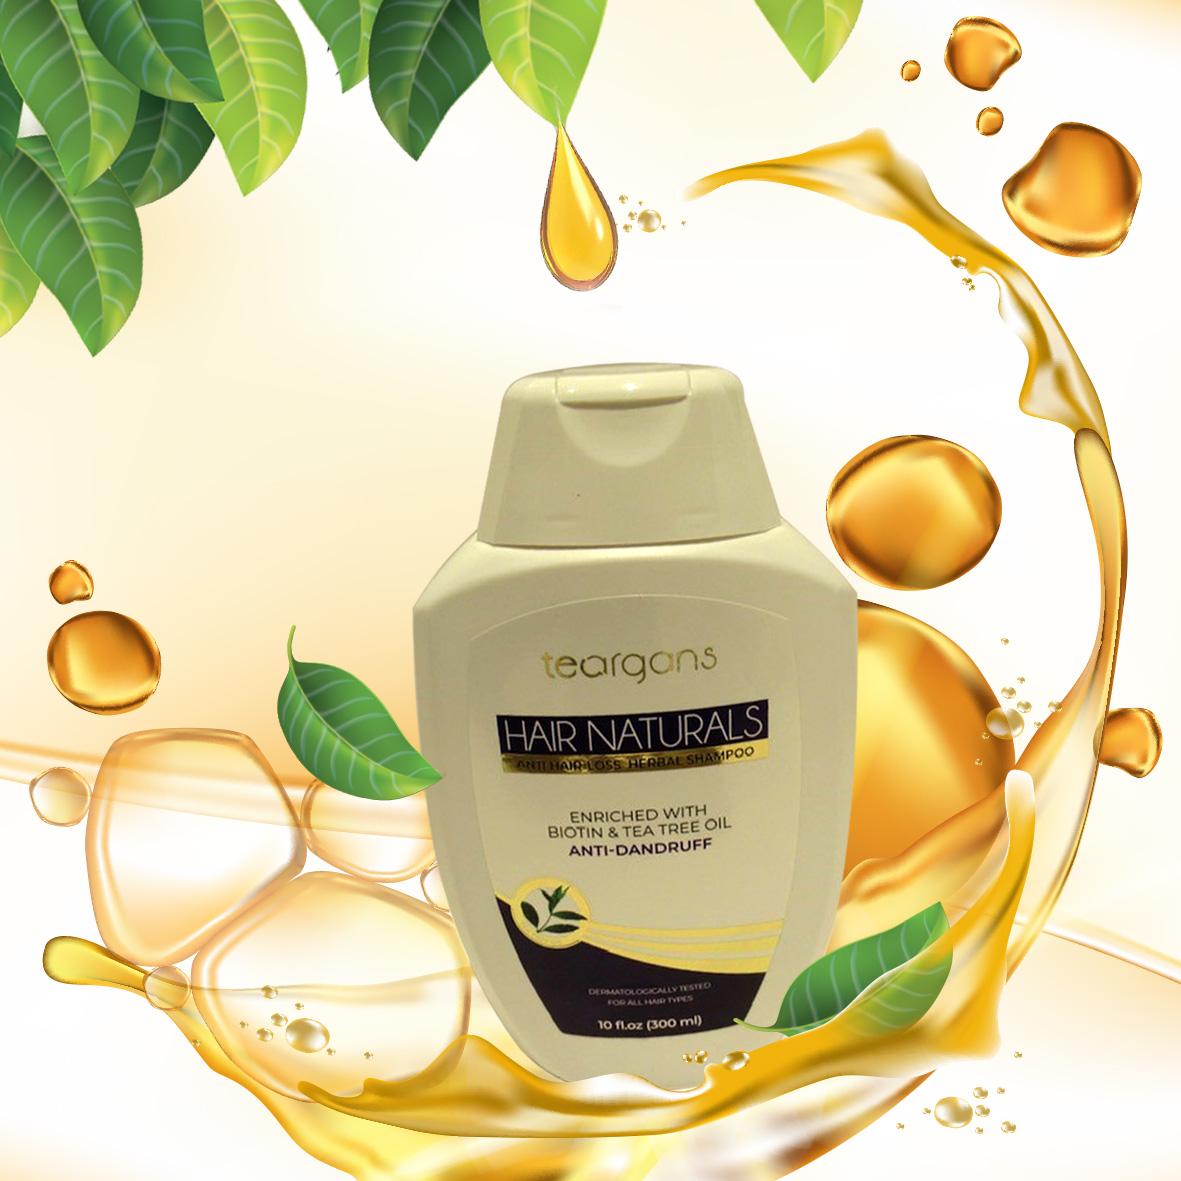 teargans anti-dandruff shampoo